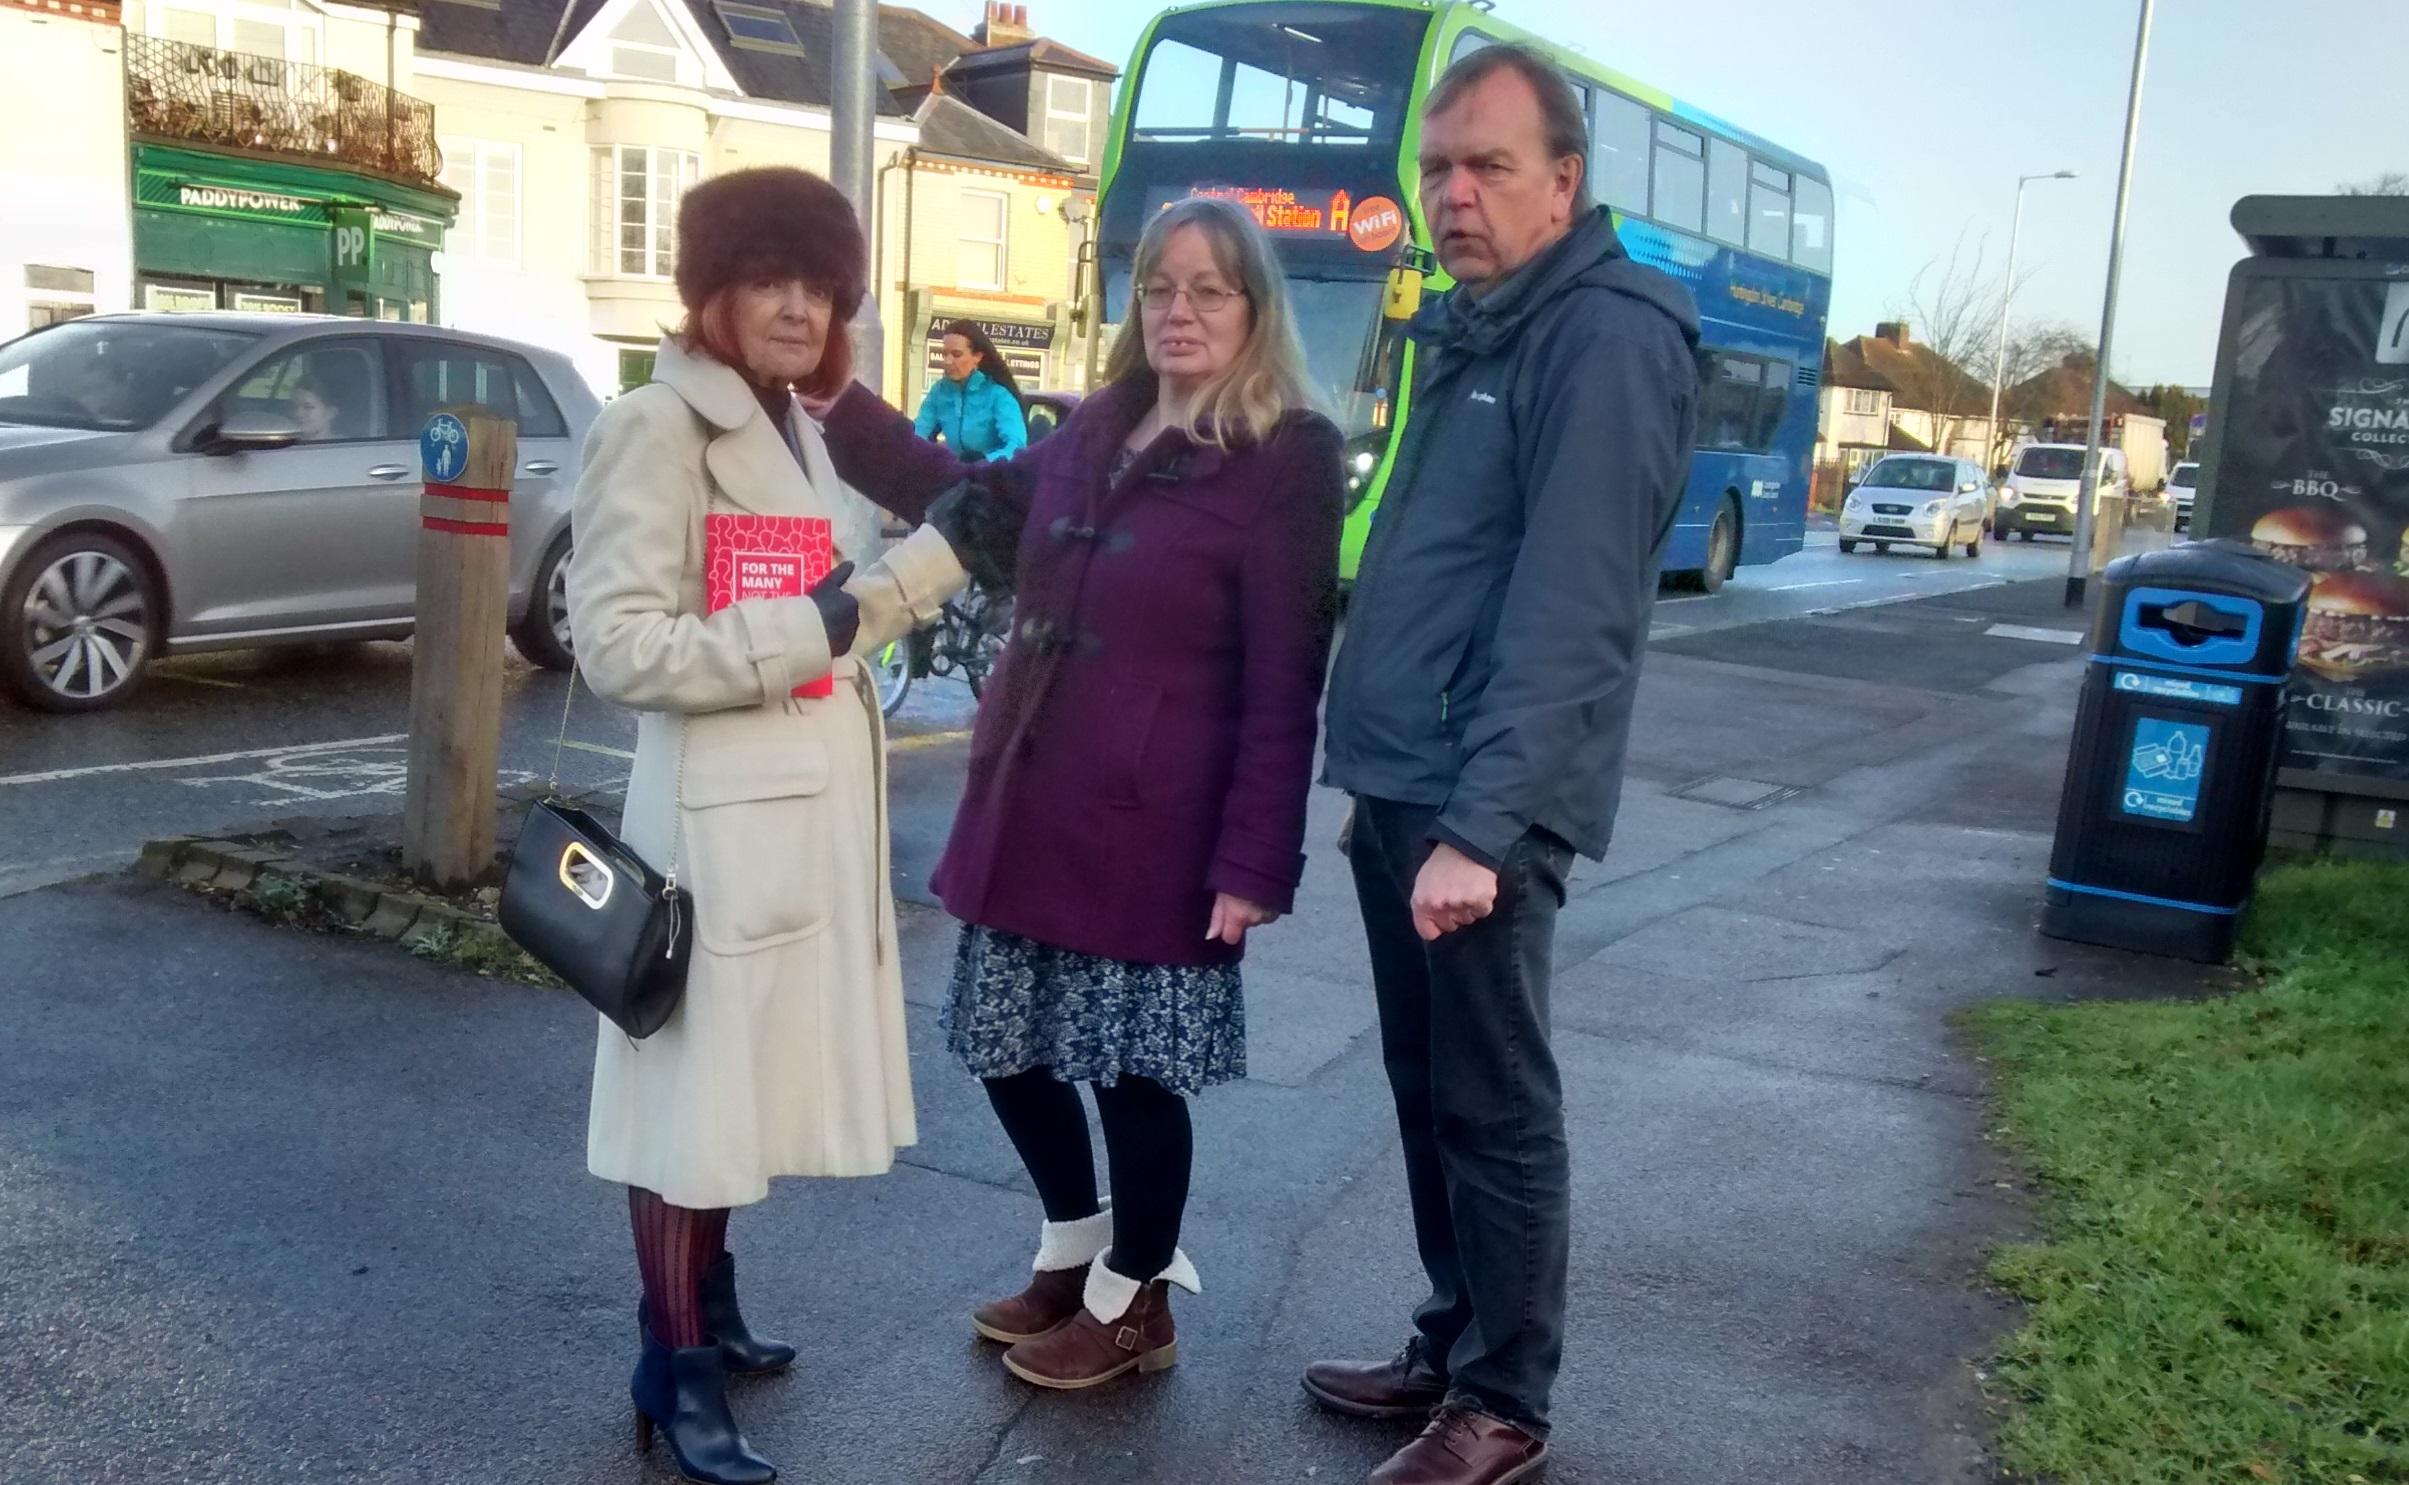 Bus_campaign_arbury_road.jpg